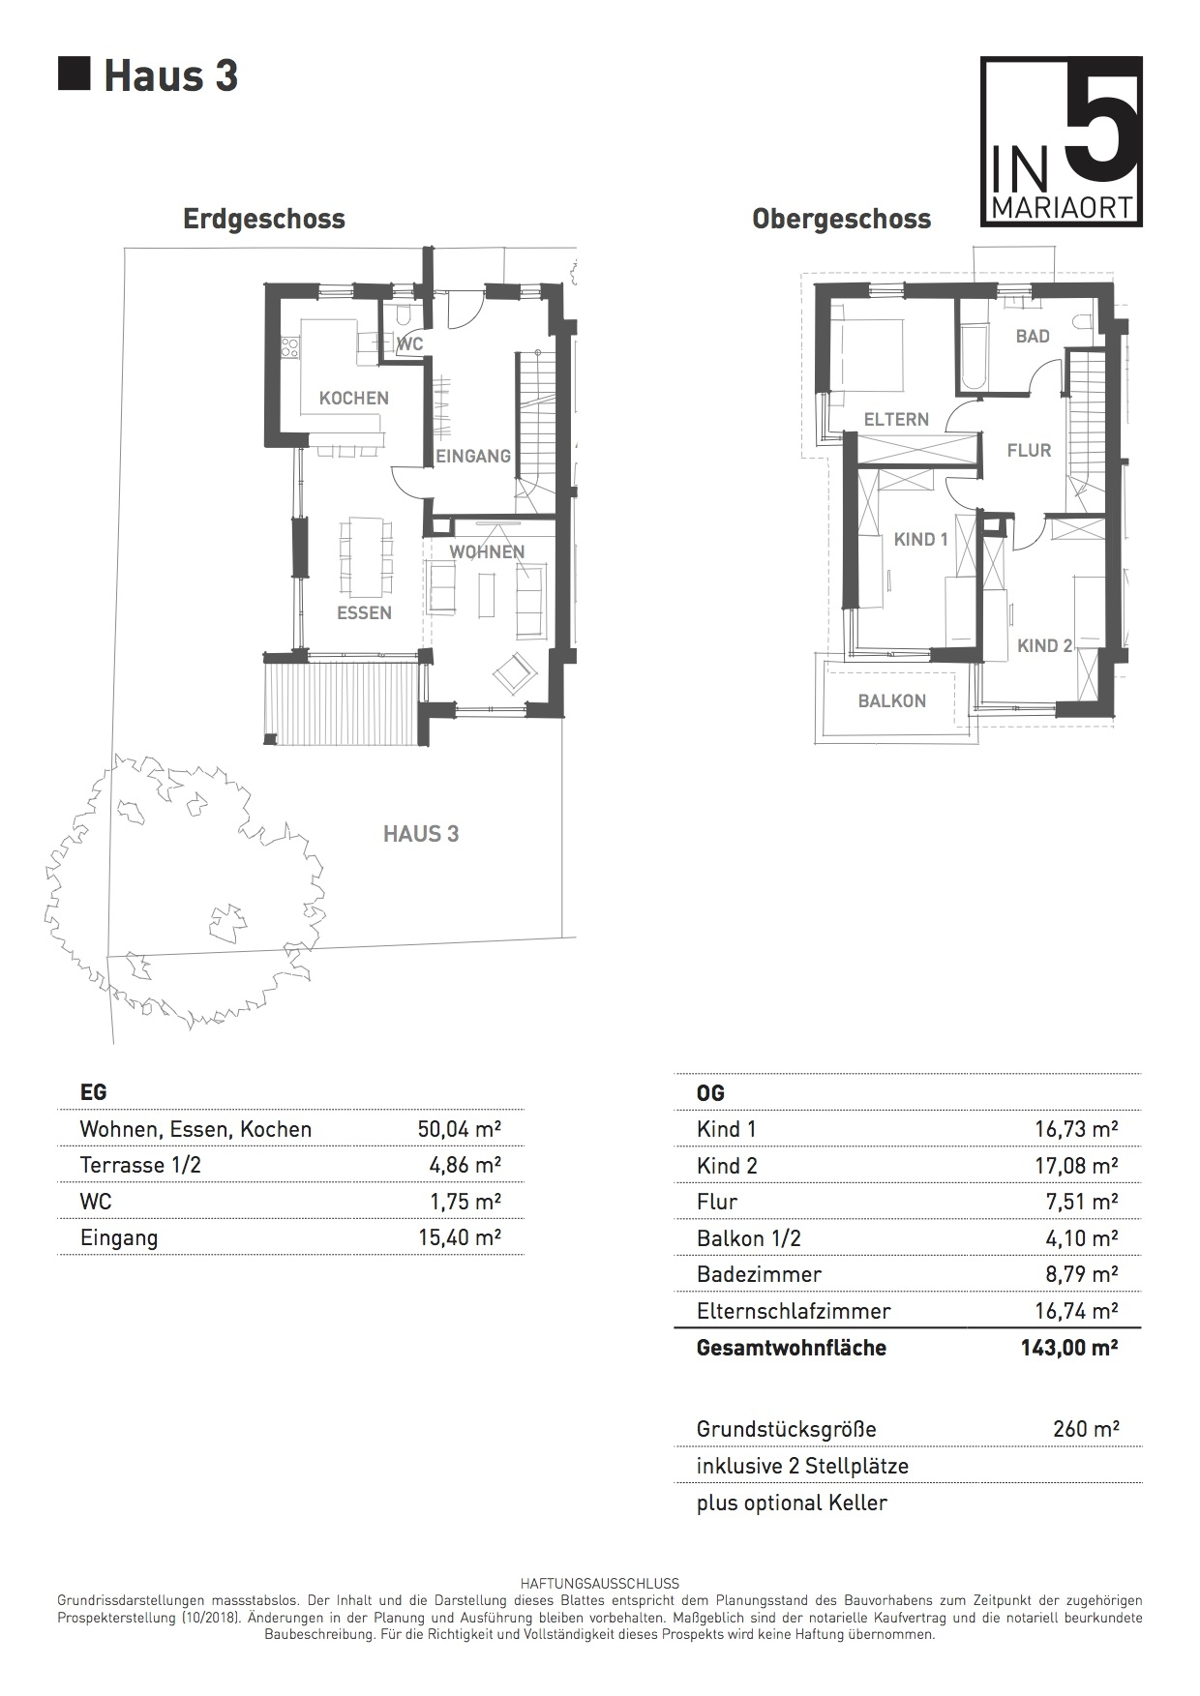 Grundriss Haus 3